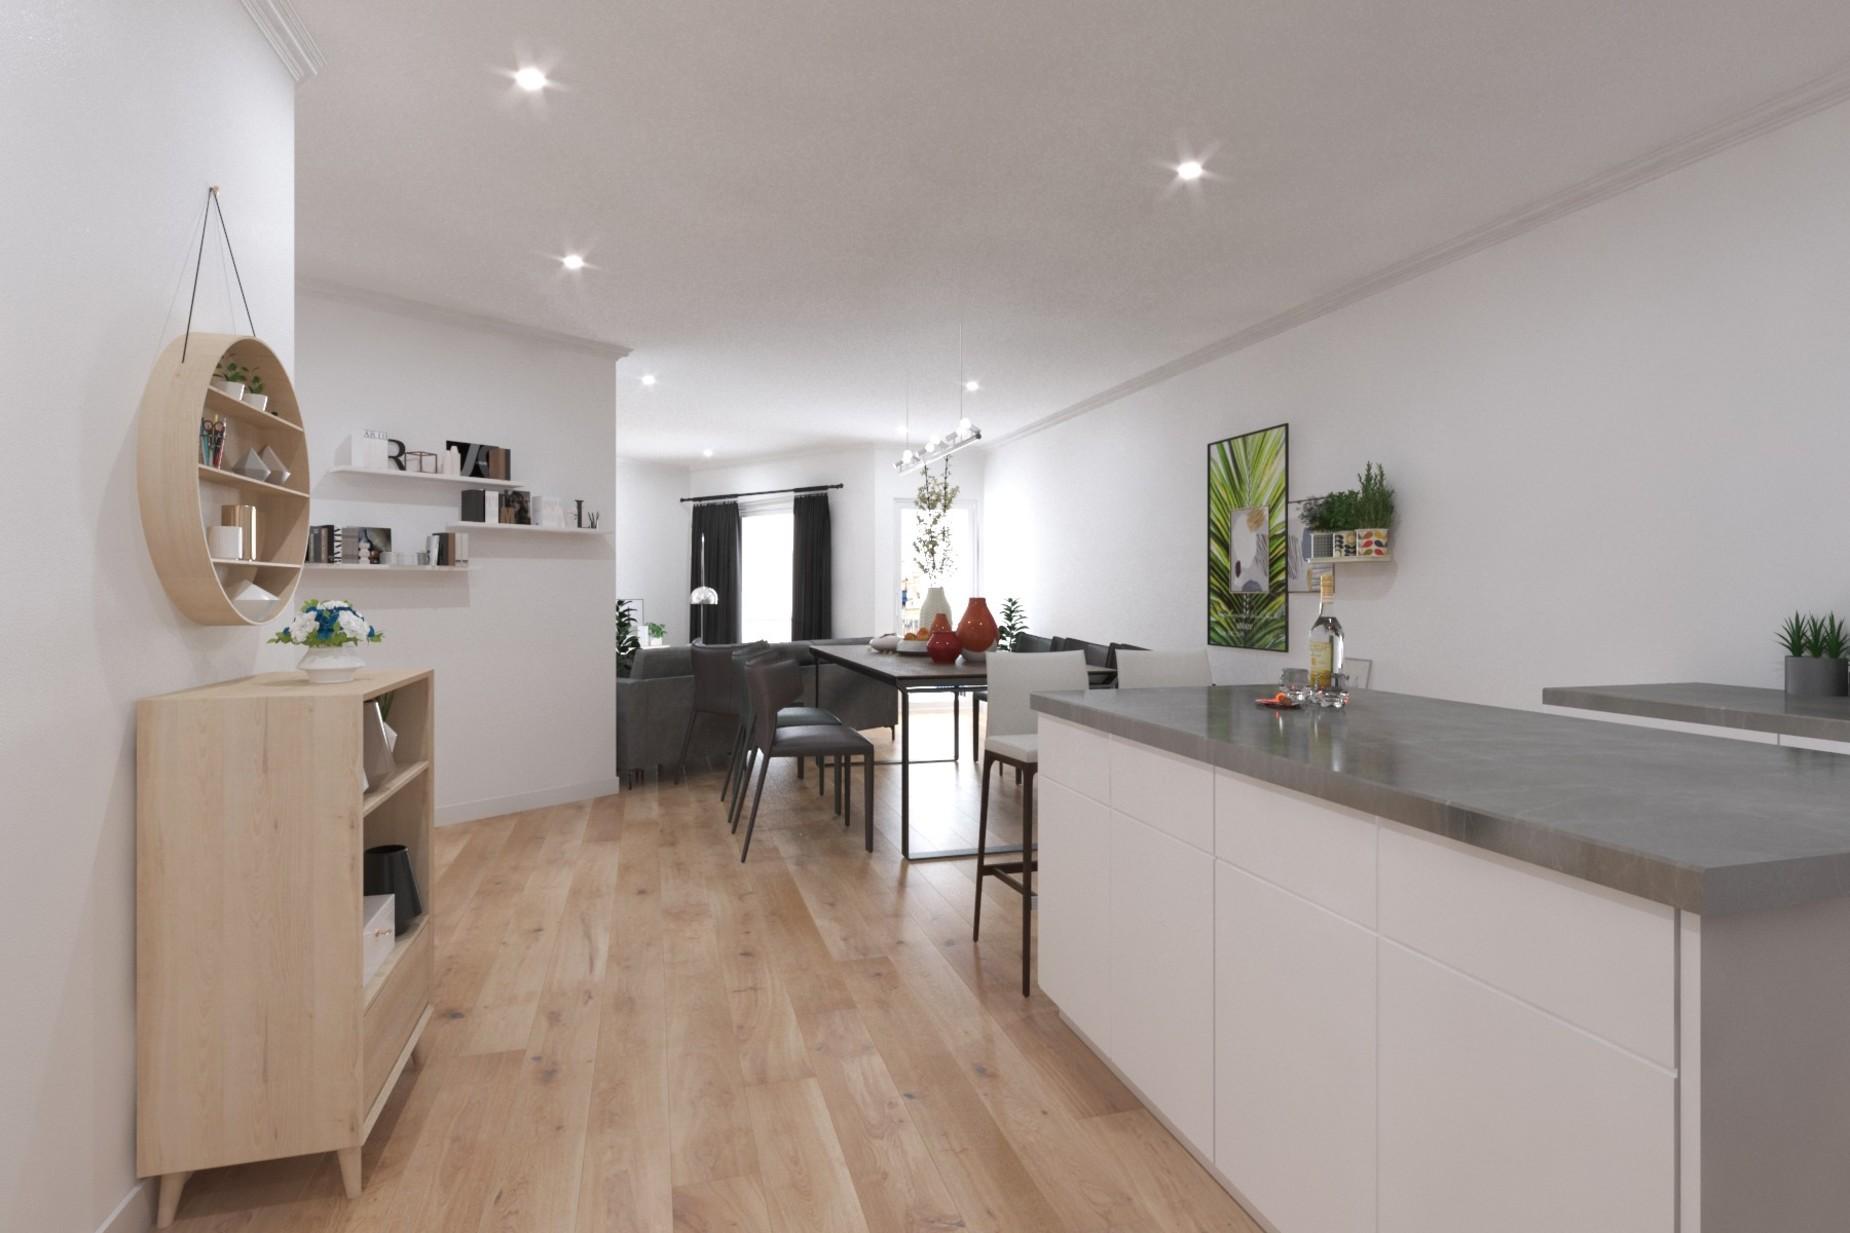 3 bed Apartment For Sale in Birkirkara, Birkirkara - thumb 5